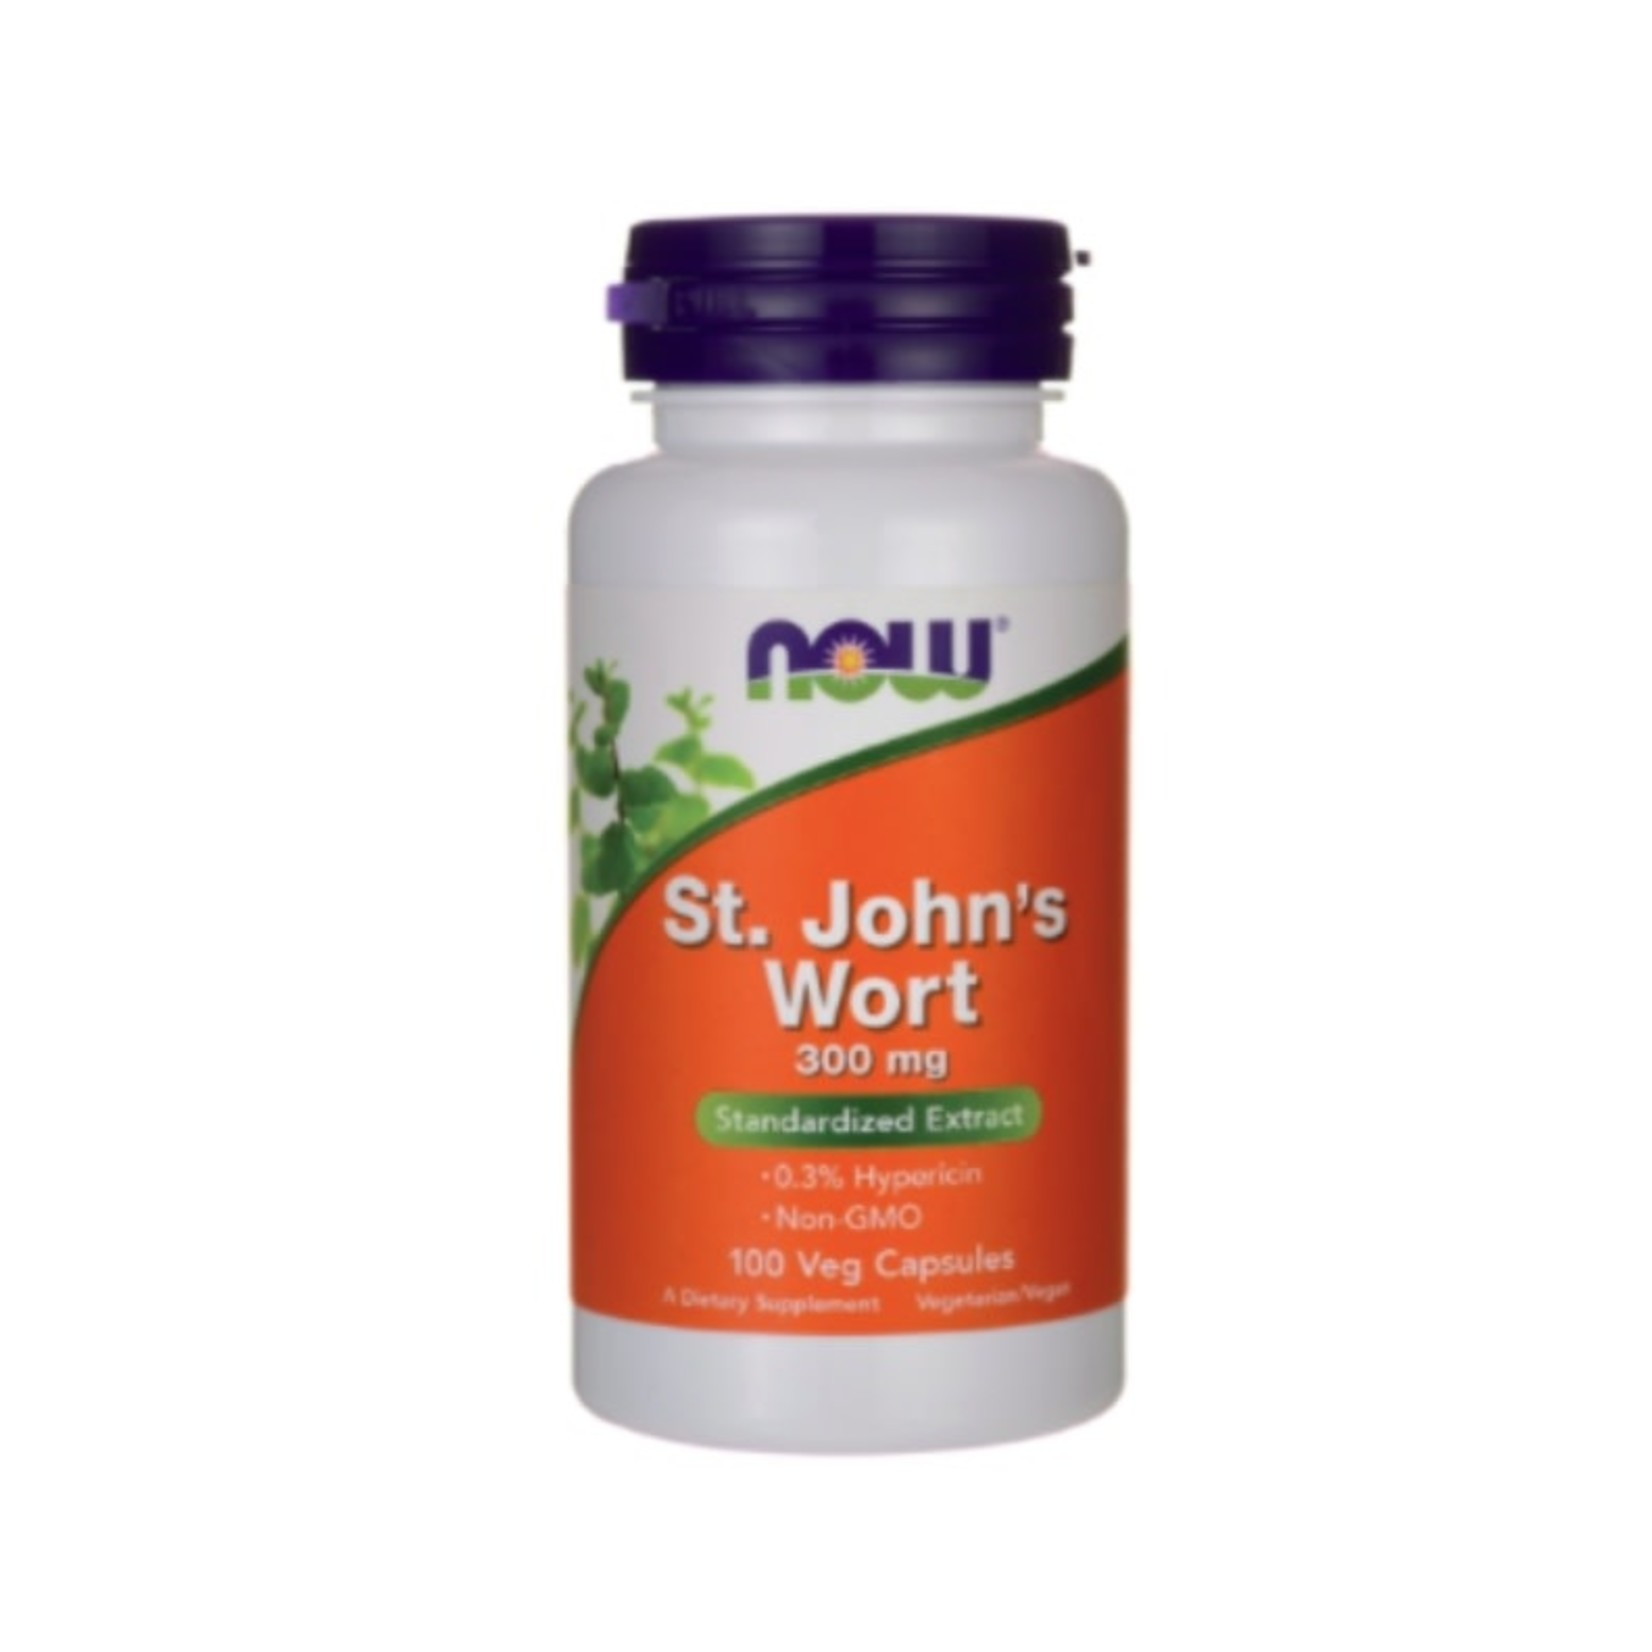 Now Now St John's Wort 300mg 100 caps